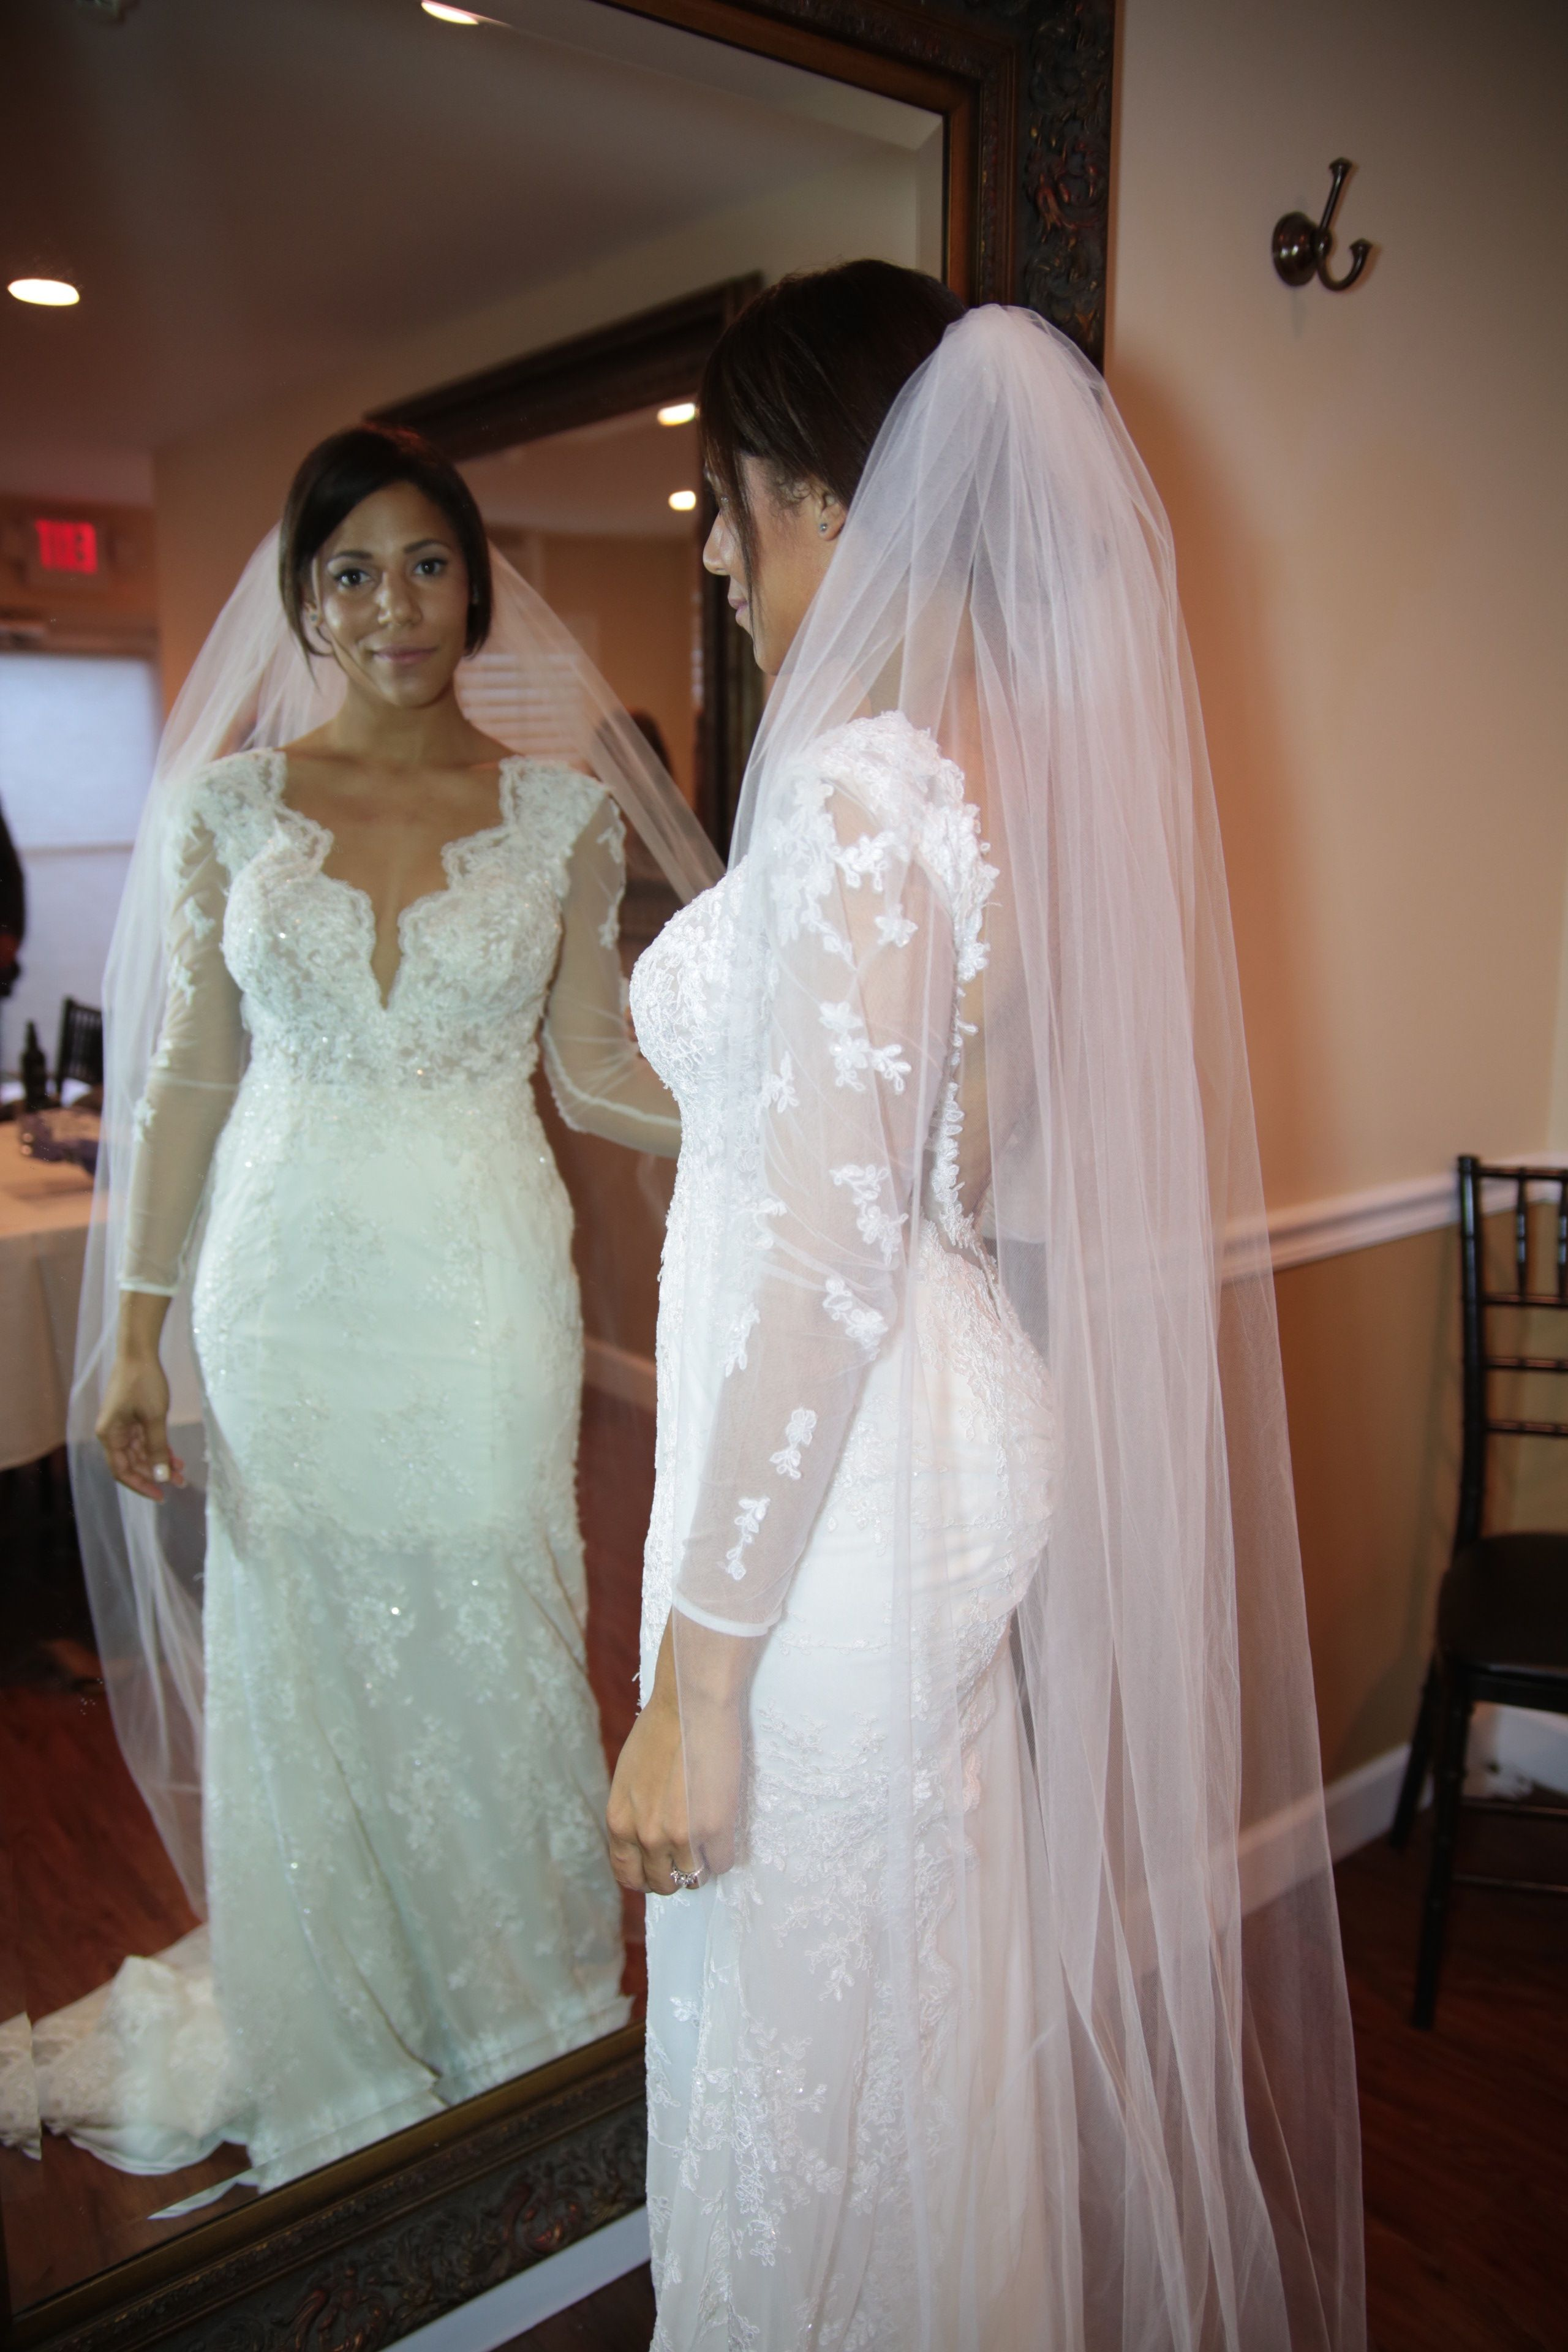 Custom made wedding dress  My custom made wedding dress Incorporating different styles